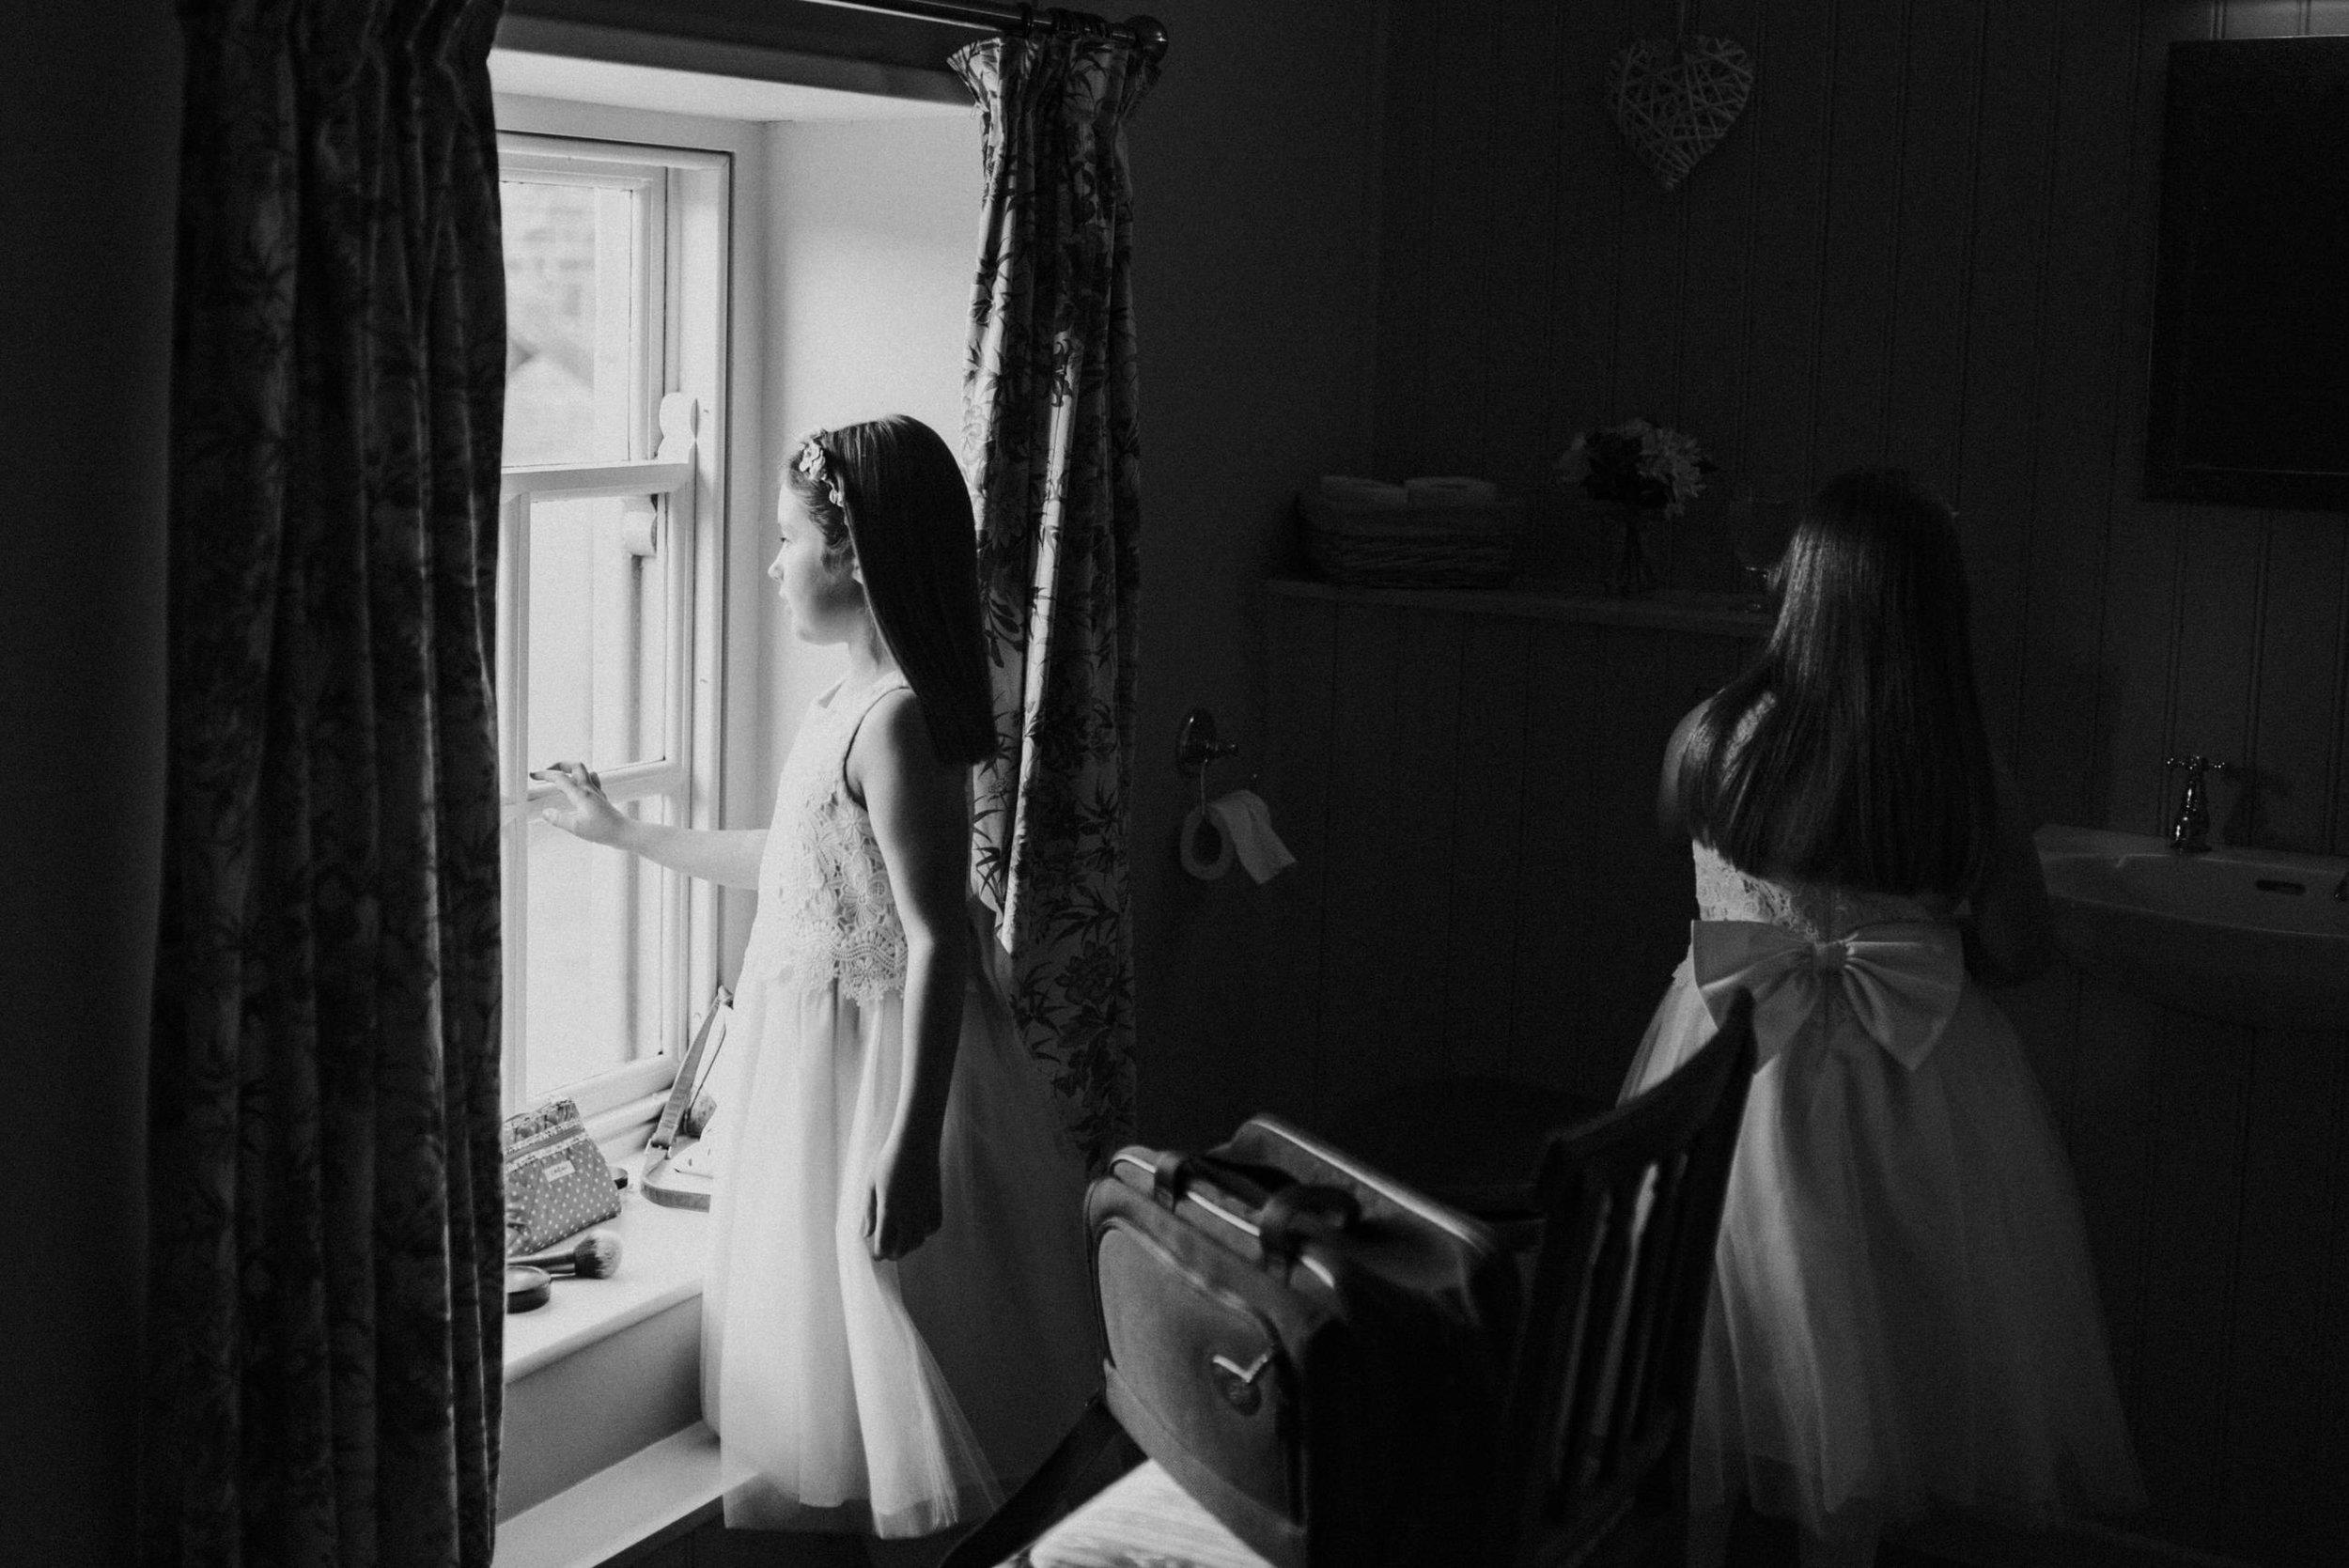 lissanoure castle wedding, northern ireland wedding photographer, romantic northern irish wedding venue, castle wedding ireland, natural wedding photography ni (41).jpg